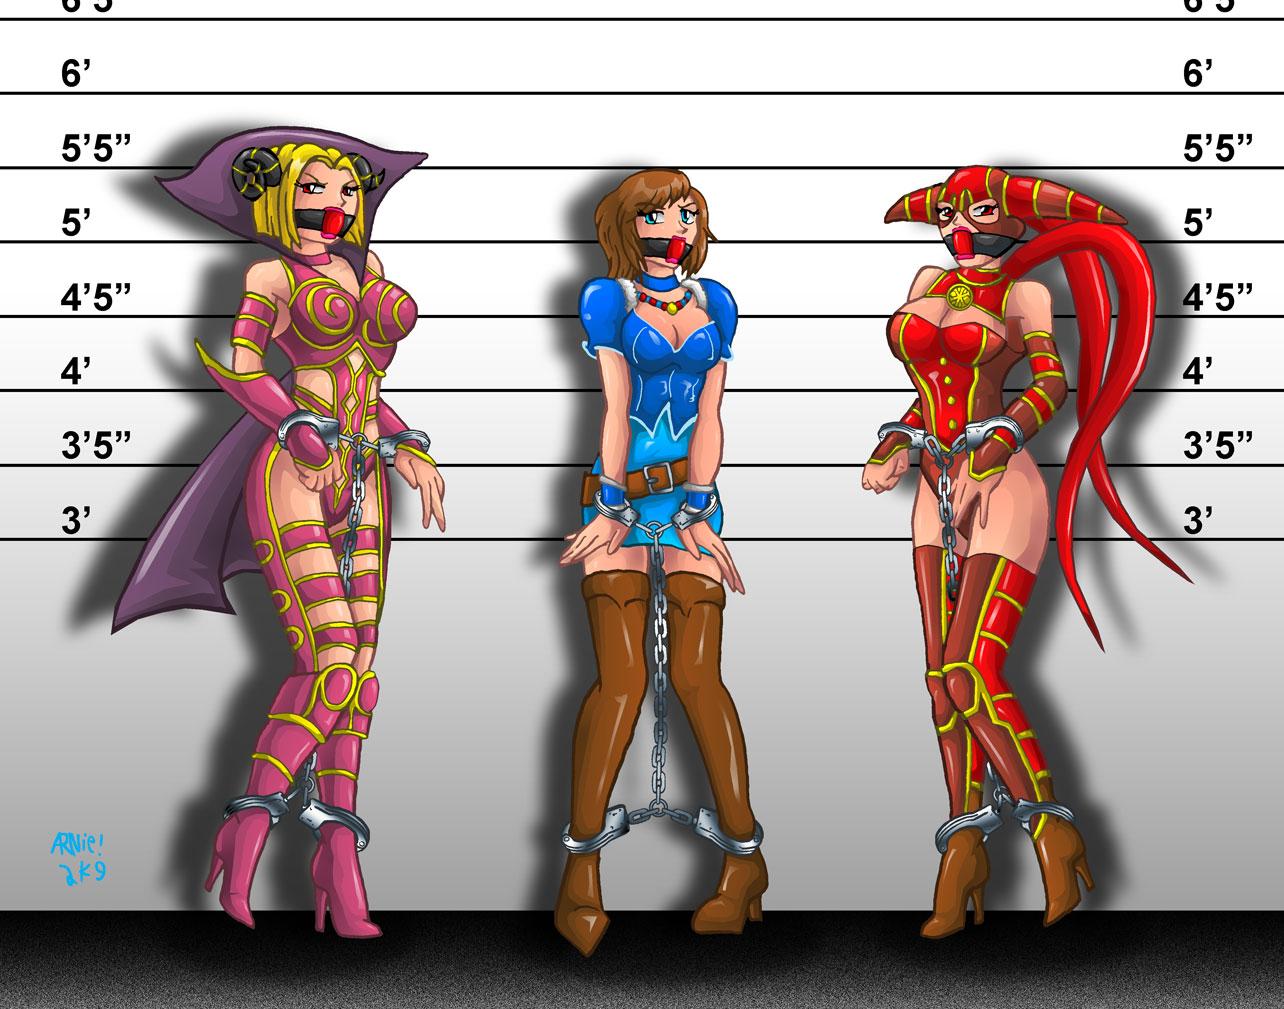 http://fc08.deviantart.net/fs41/f/2009/049/e/b/Godhand_Gals_Police_Lineup_by_ARNie00.jpg